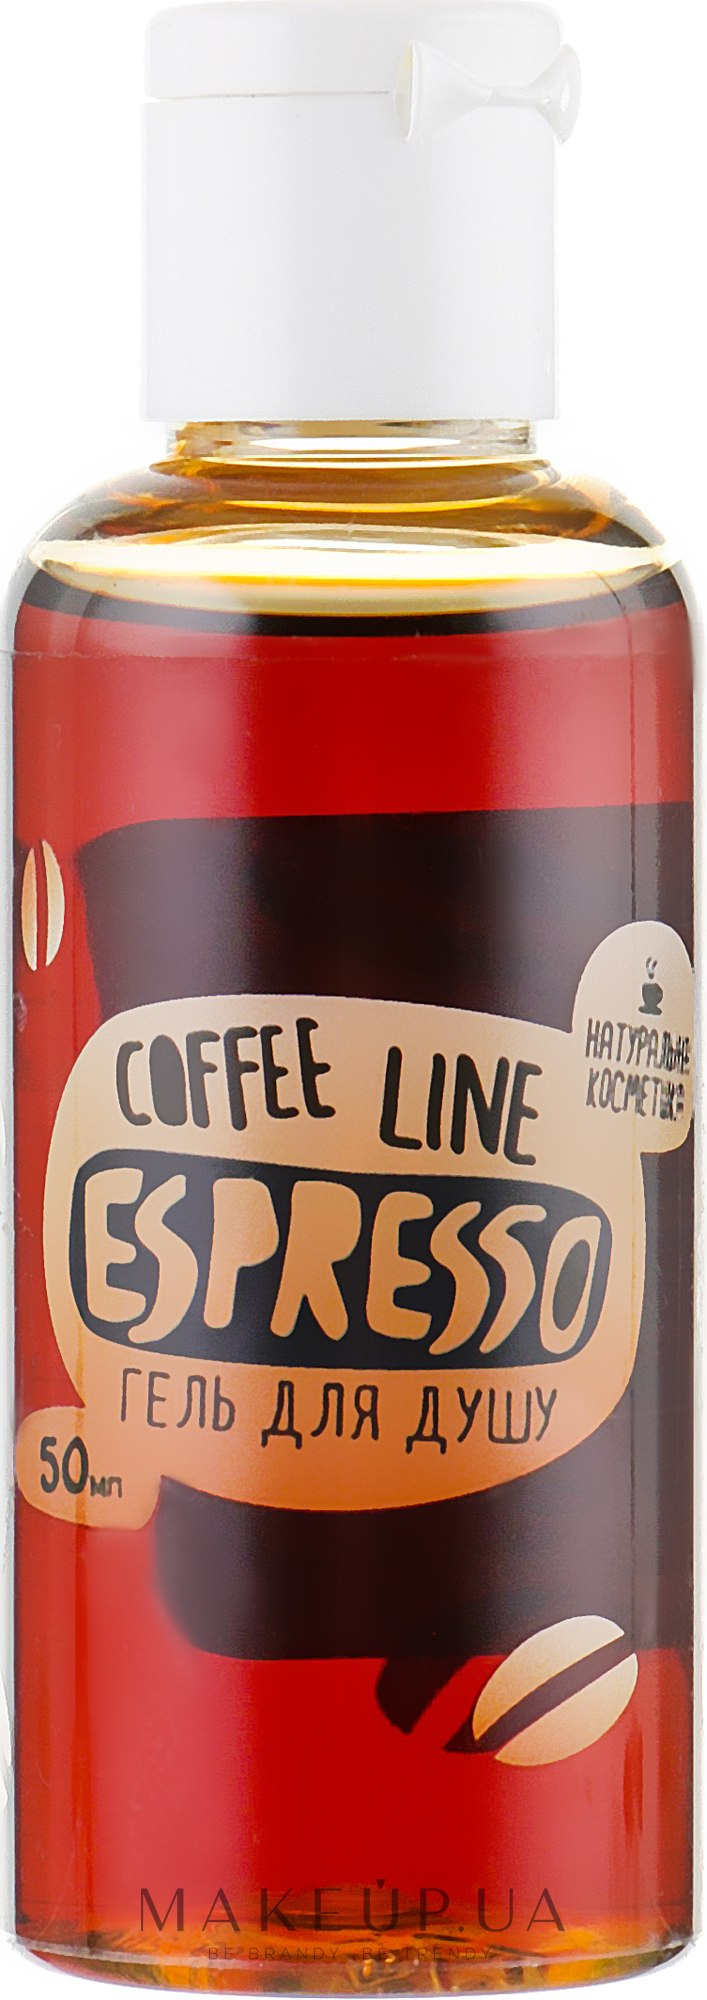 "Гель для душа ""Espresso"" - InJoy Coffee Line — фото 50ml"